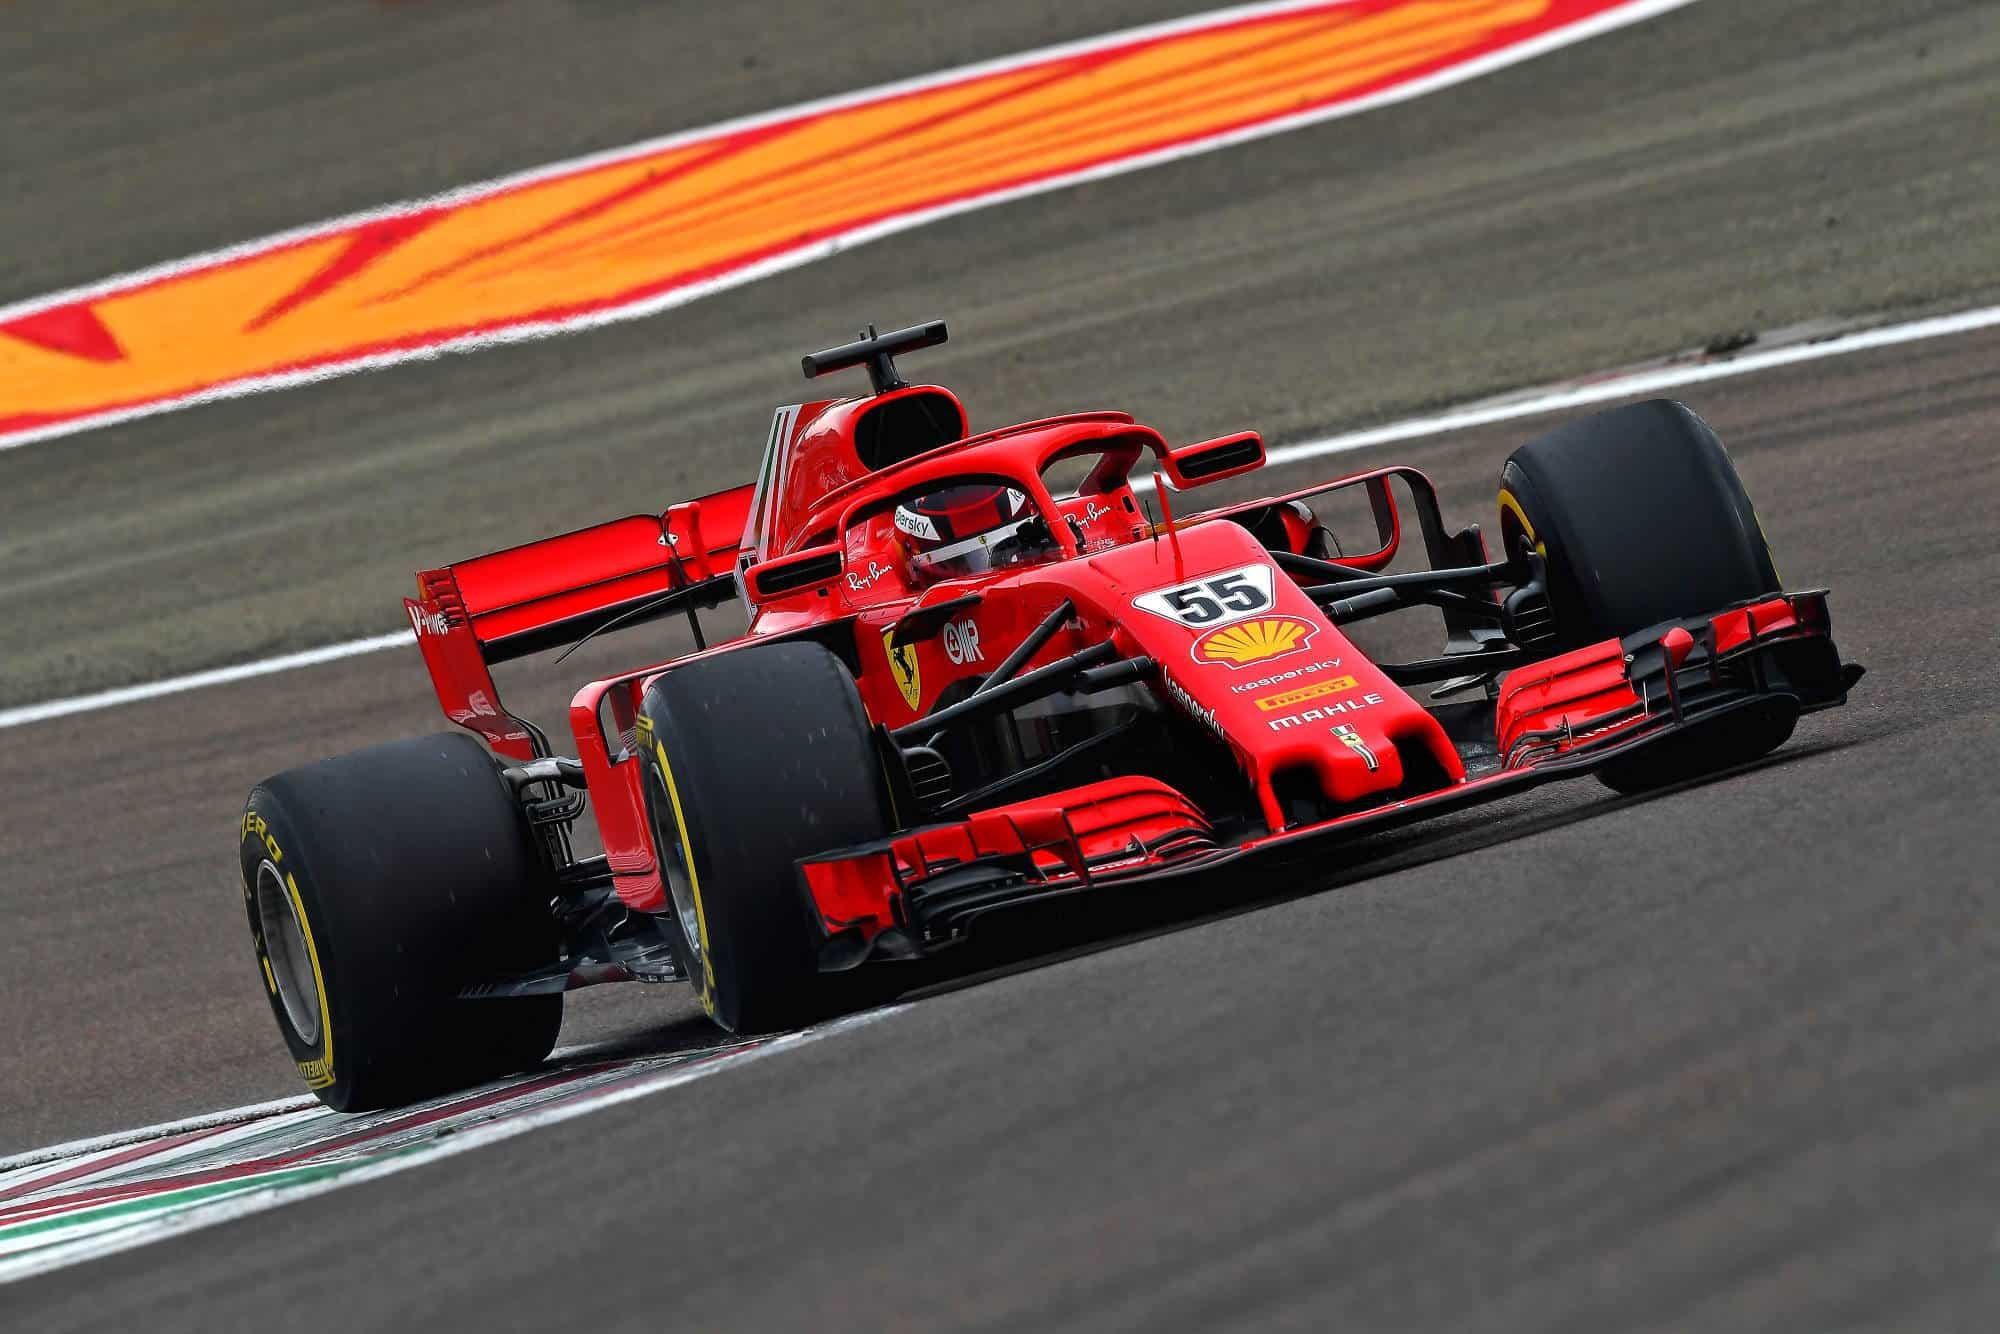 2021 Fiorano Carlos Sainz first Ferrari test on track Fiorano Ferrari SF71H 2018 on Wed 27 Jan 2021 Photo Ferrari